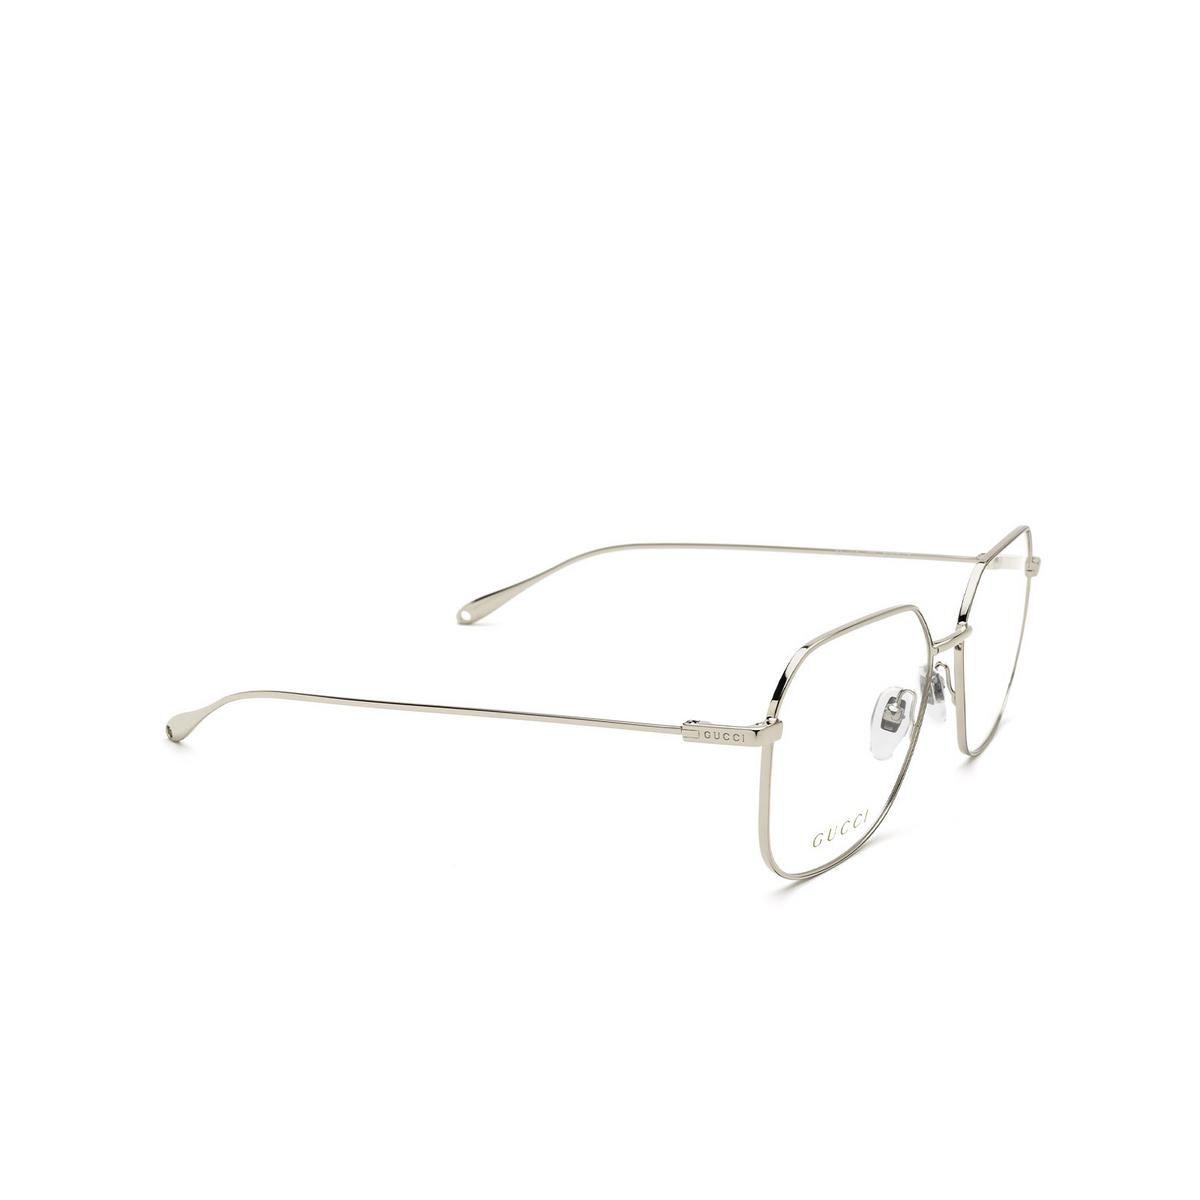 Gucci® Square Eyeglasses: GG1032O color Silver 003 - three-quarters view.